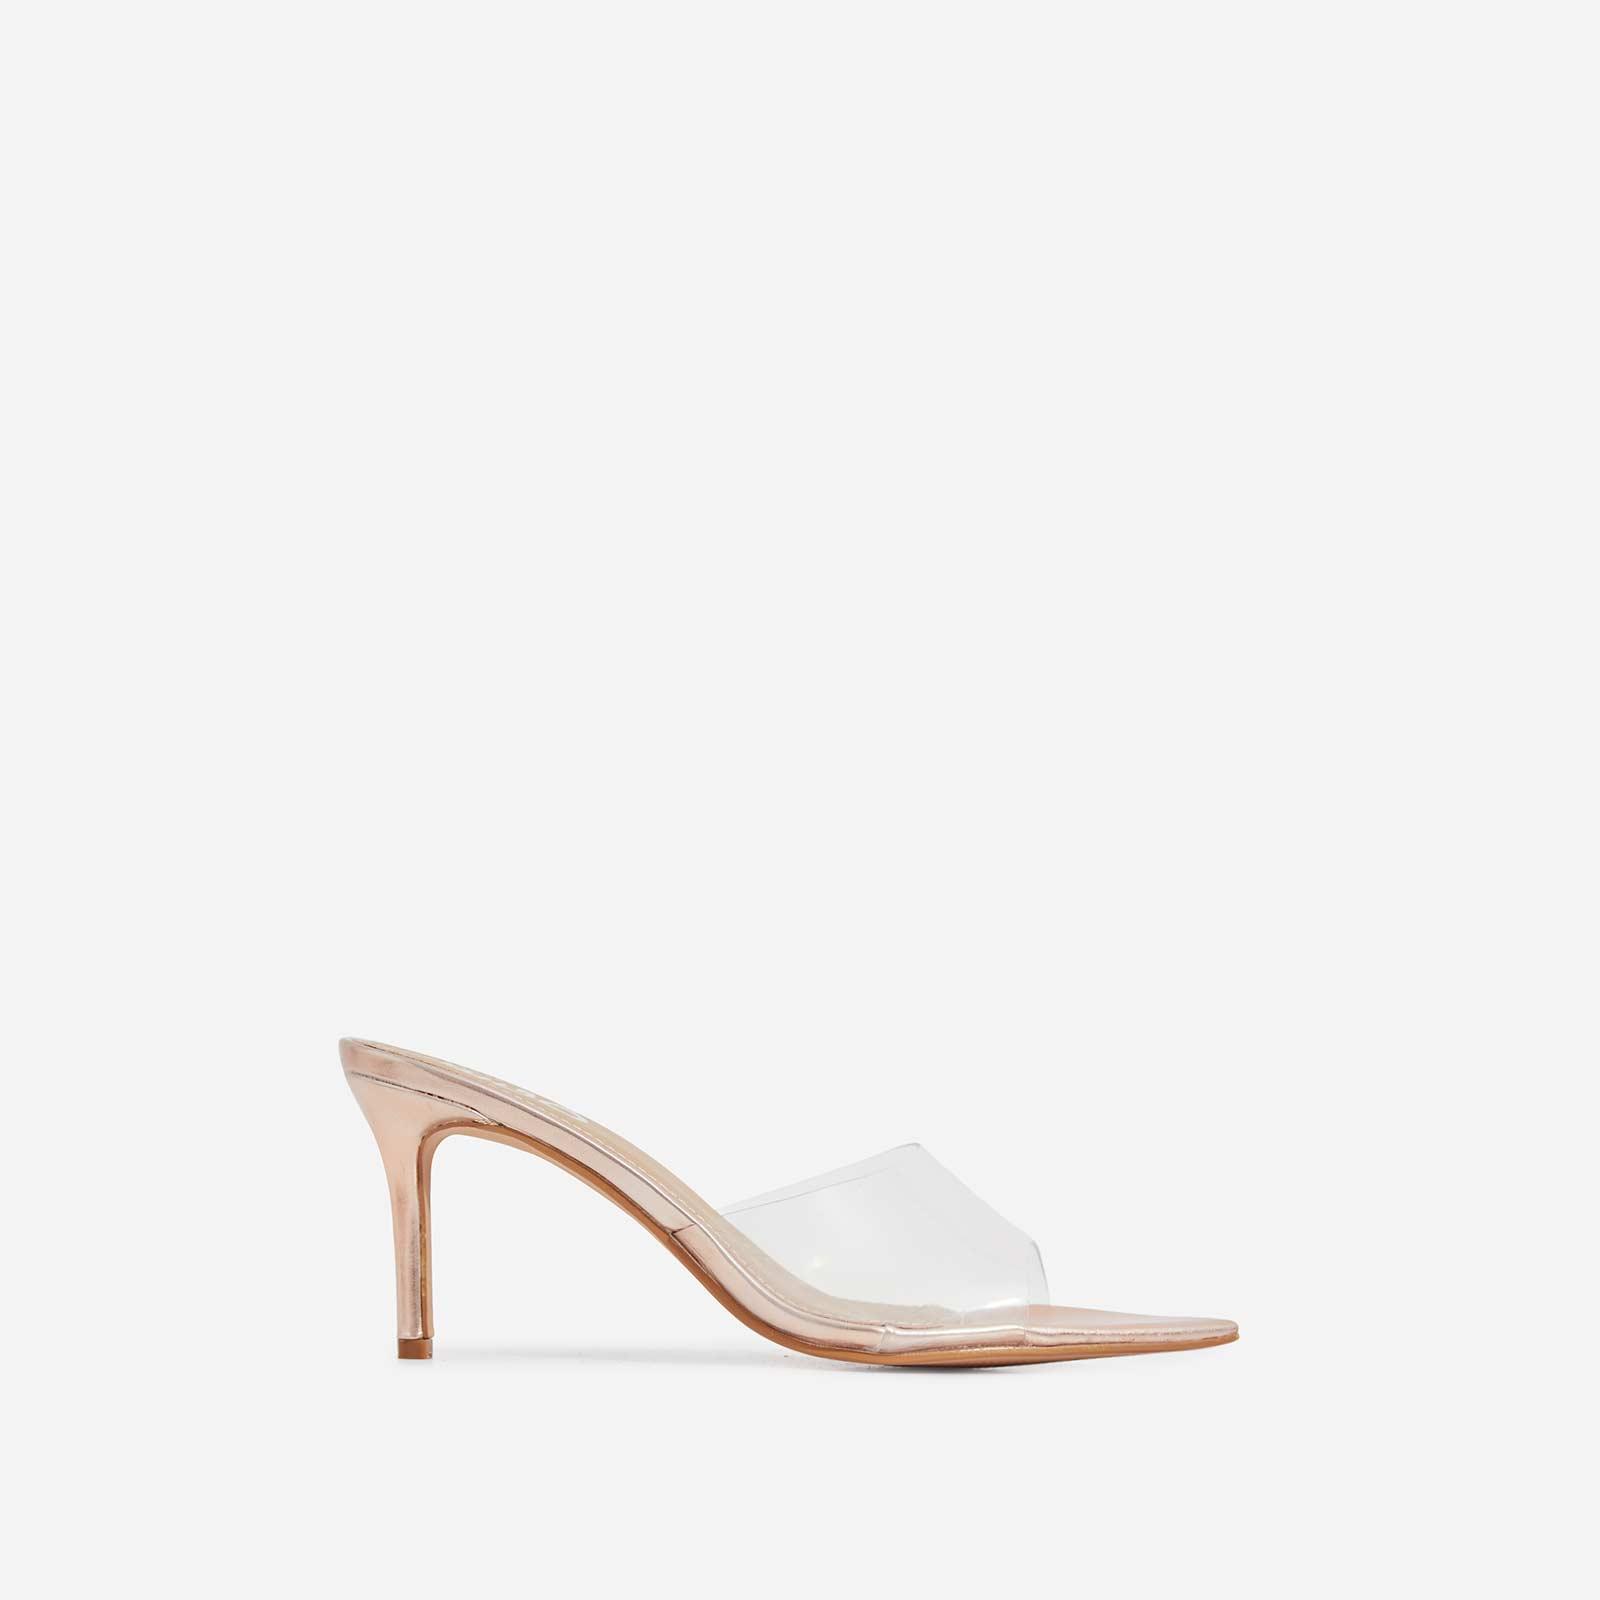 Maelle Pointed Peep Toe Perspex Heel Mule In Rose Gold Faux Leather